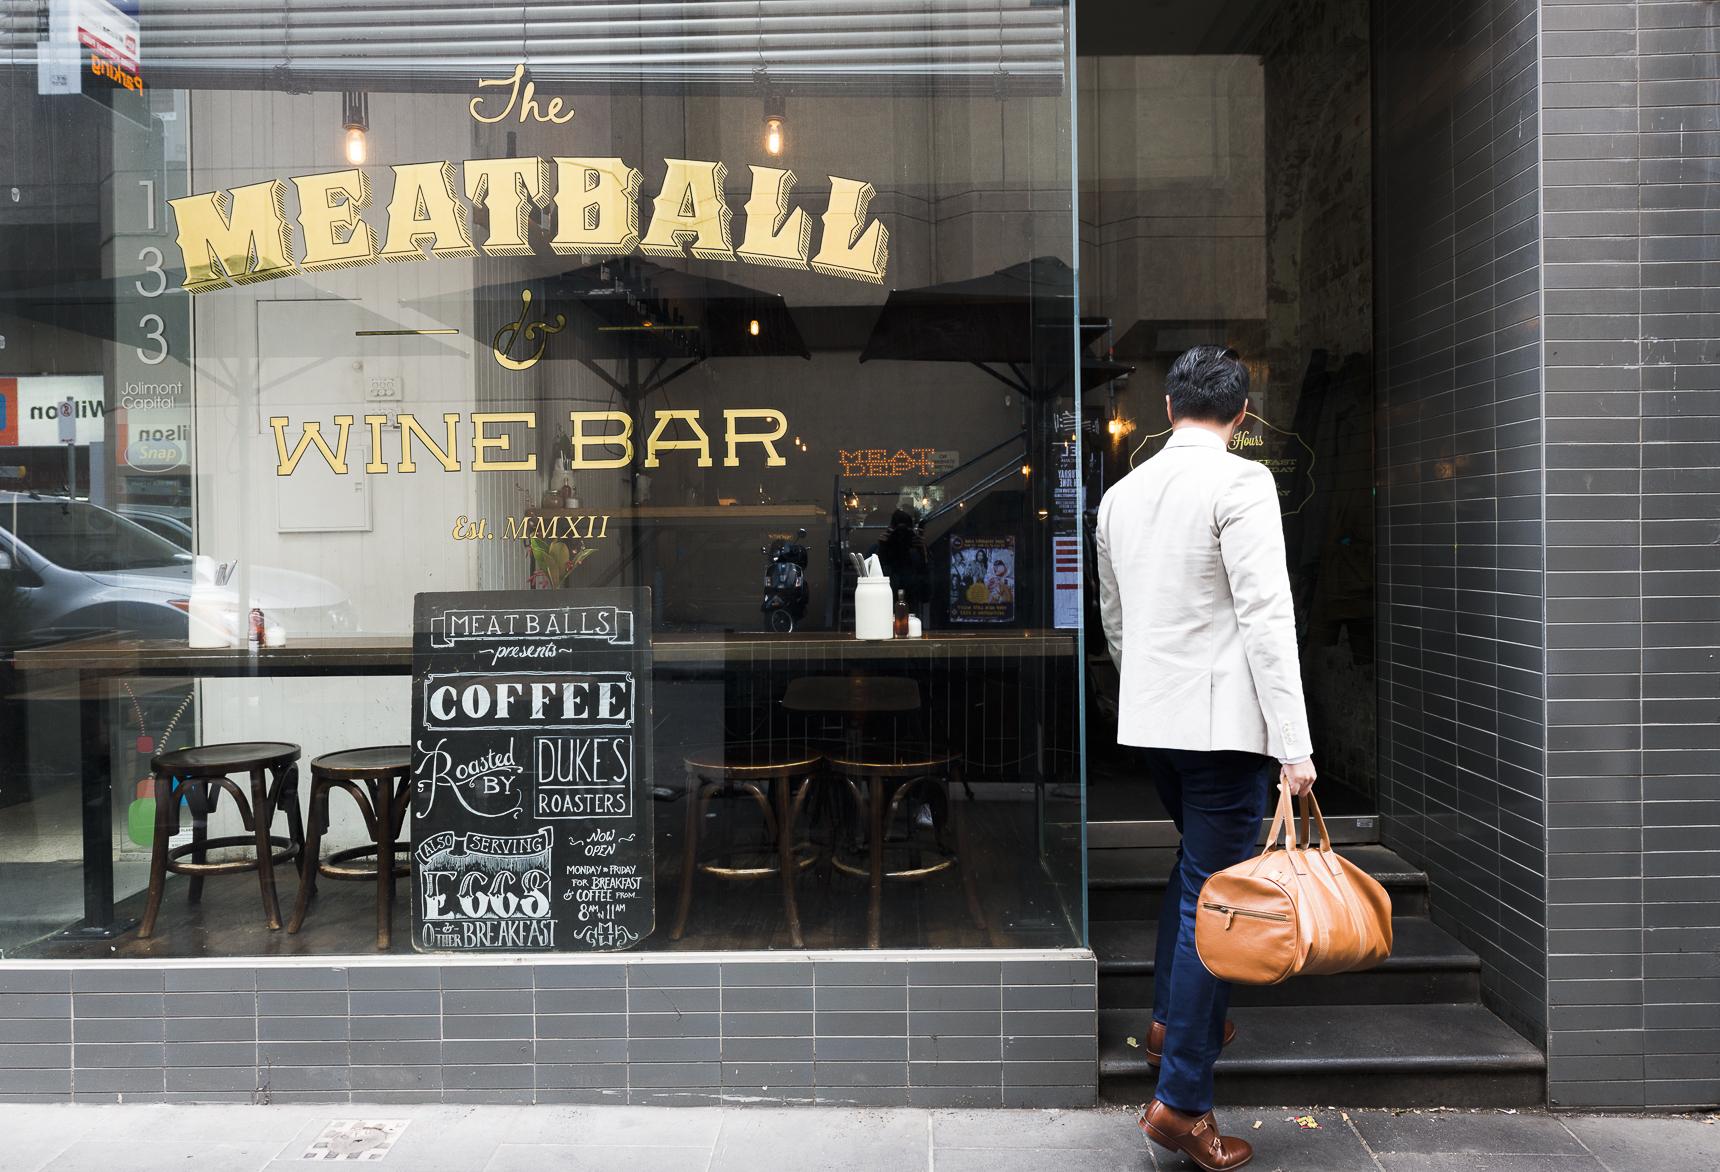 Meatball and wine bar Capi Mr Gumbatron